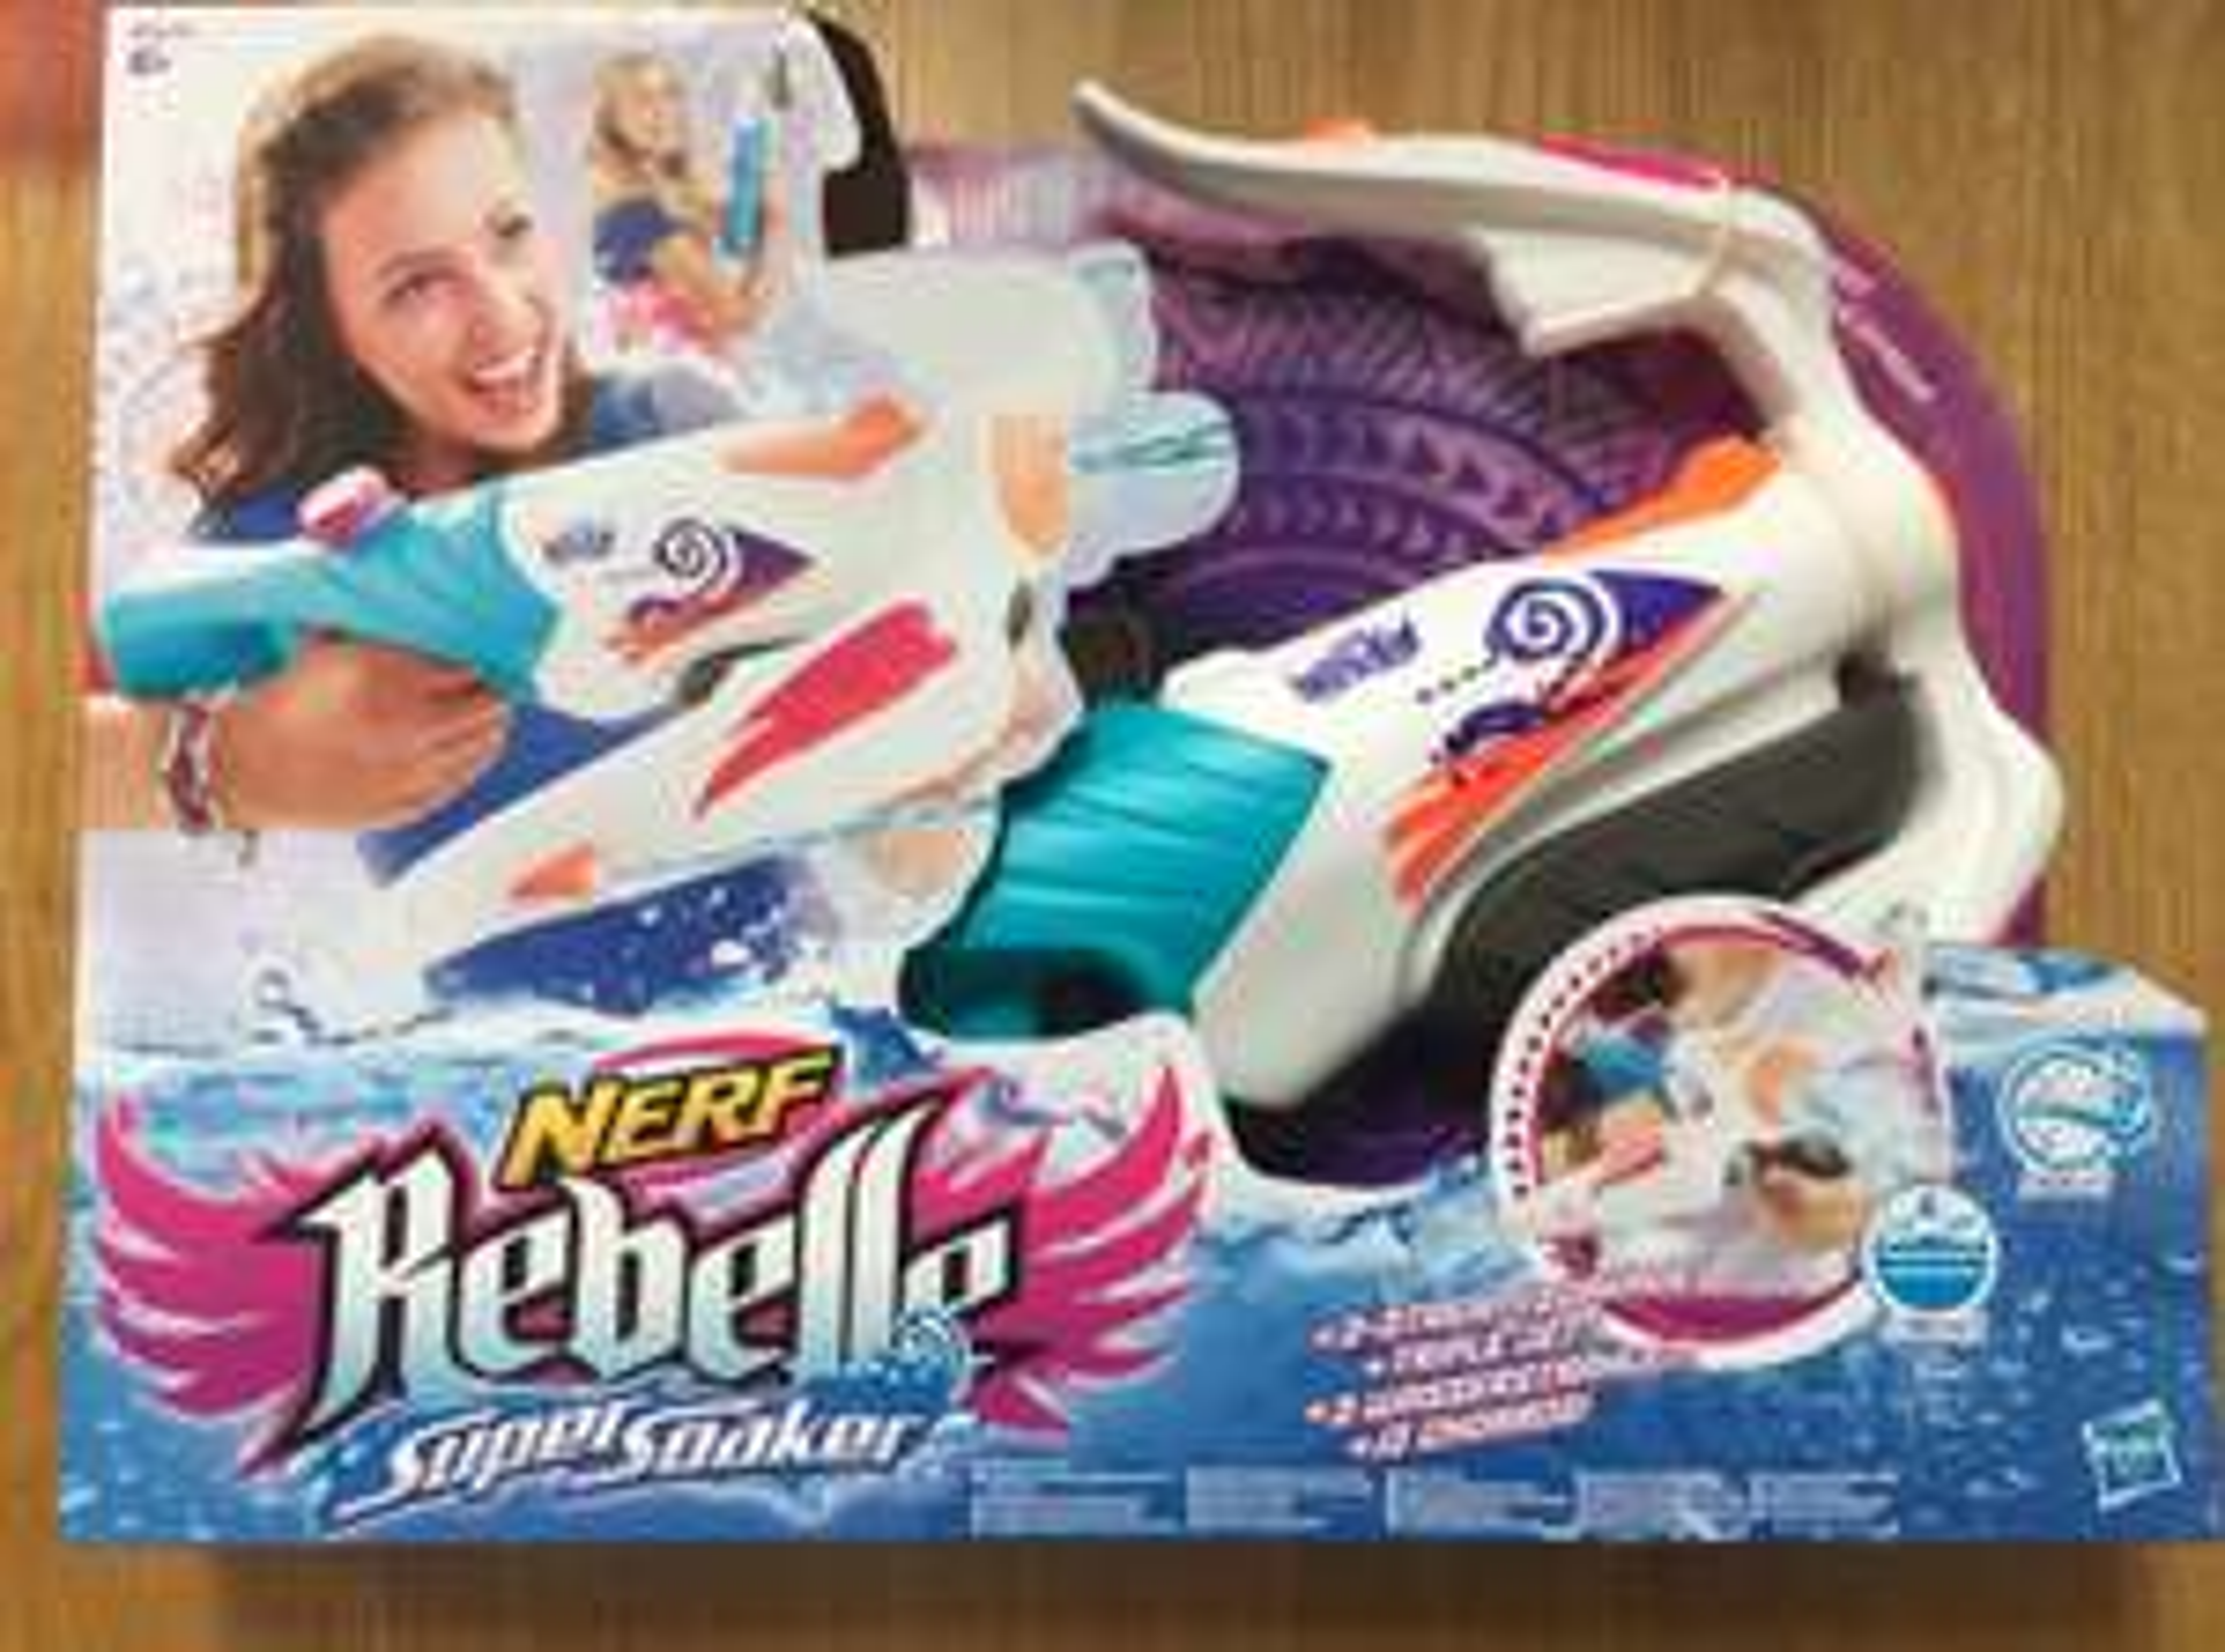 Nerf Rebelle Super Soaker watergun instore at Home Bargains - £6.99